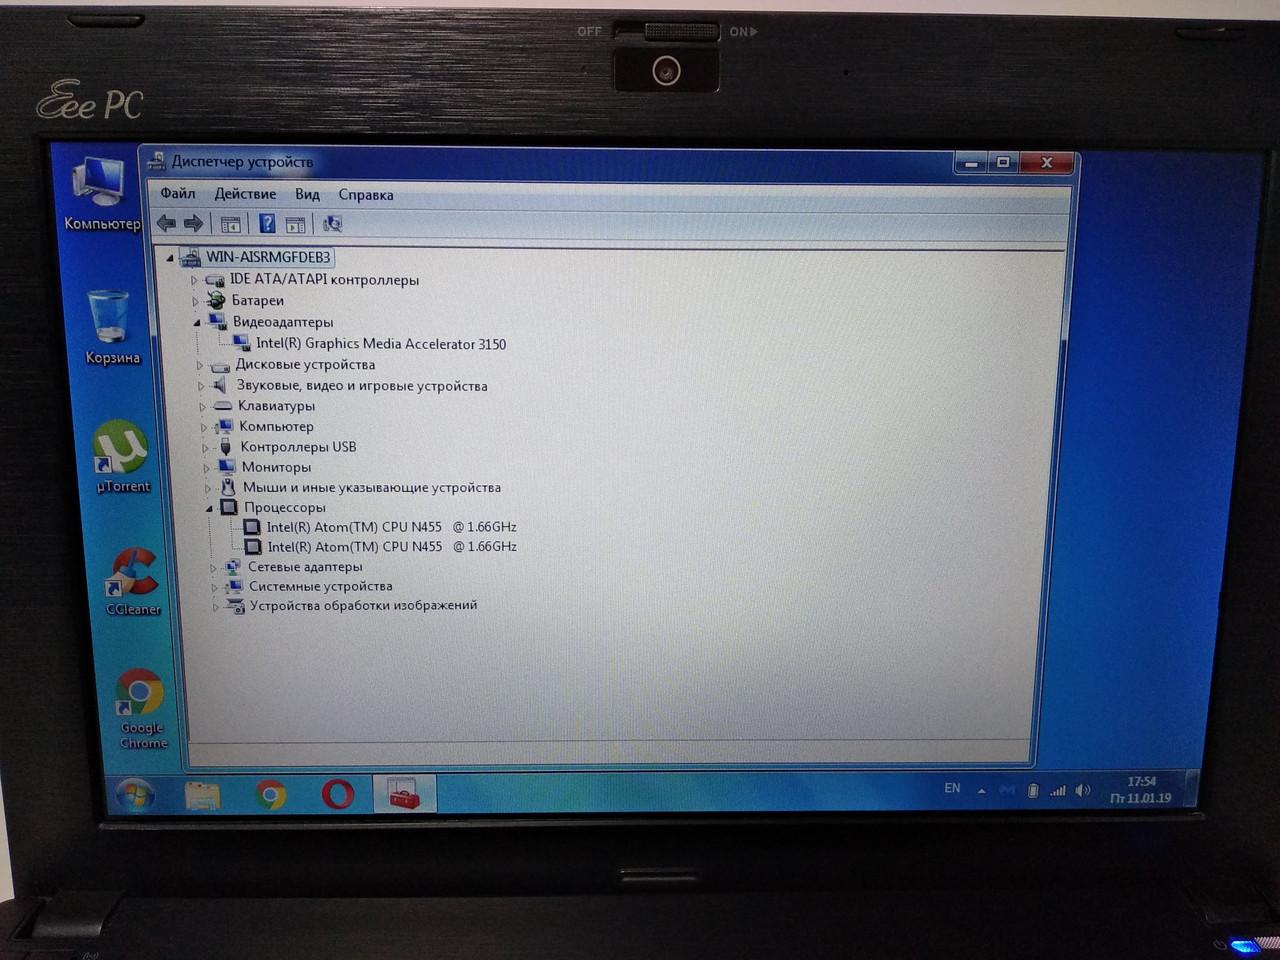 INTEL R ATOM TM CPU N455 WINDOWS 8.1 DRIVERS DOWNLOAD